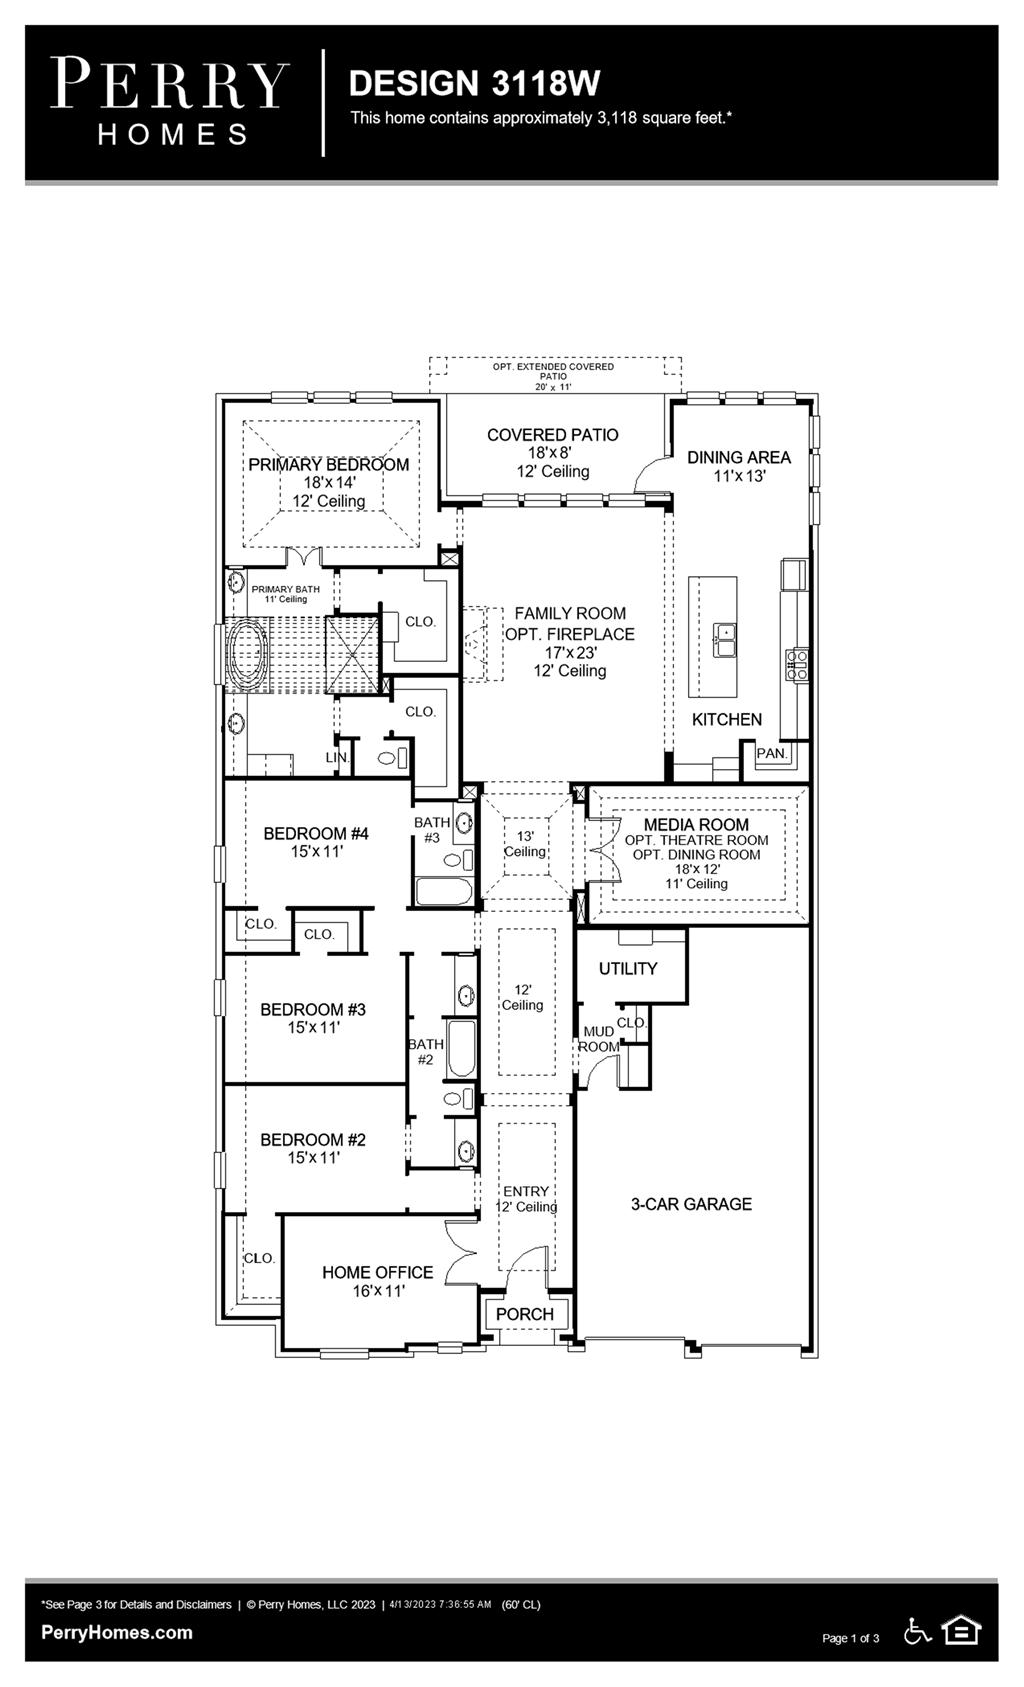 Floor Plan for 3118W